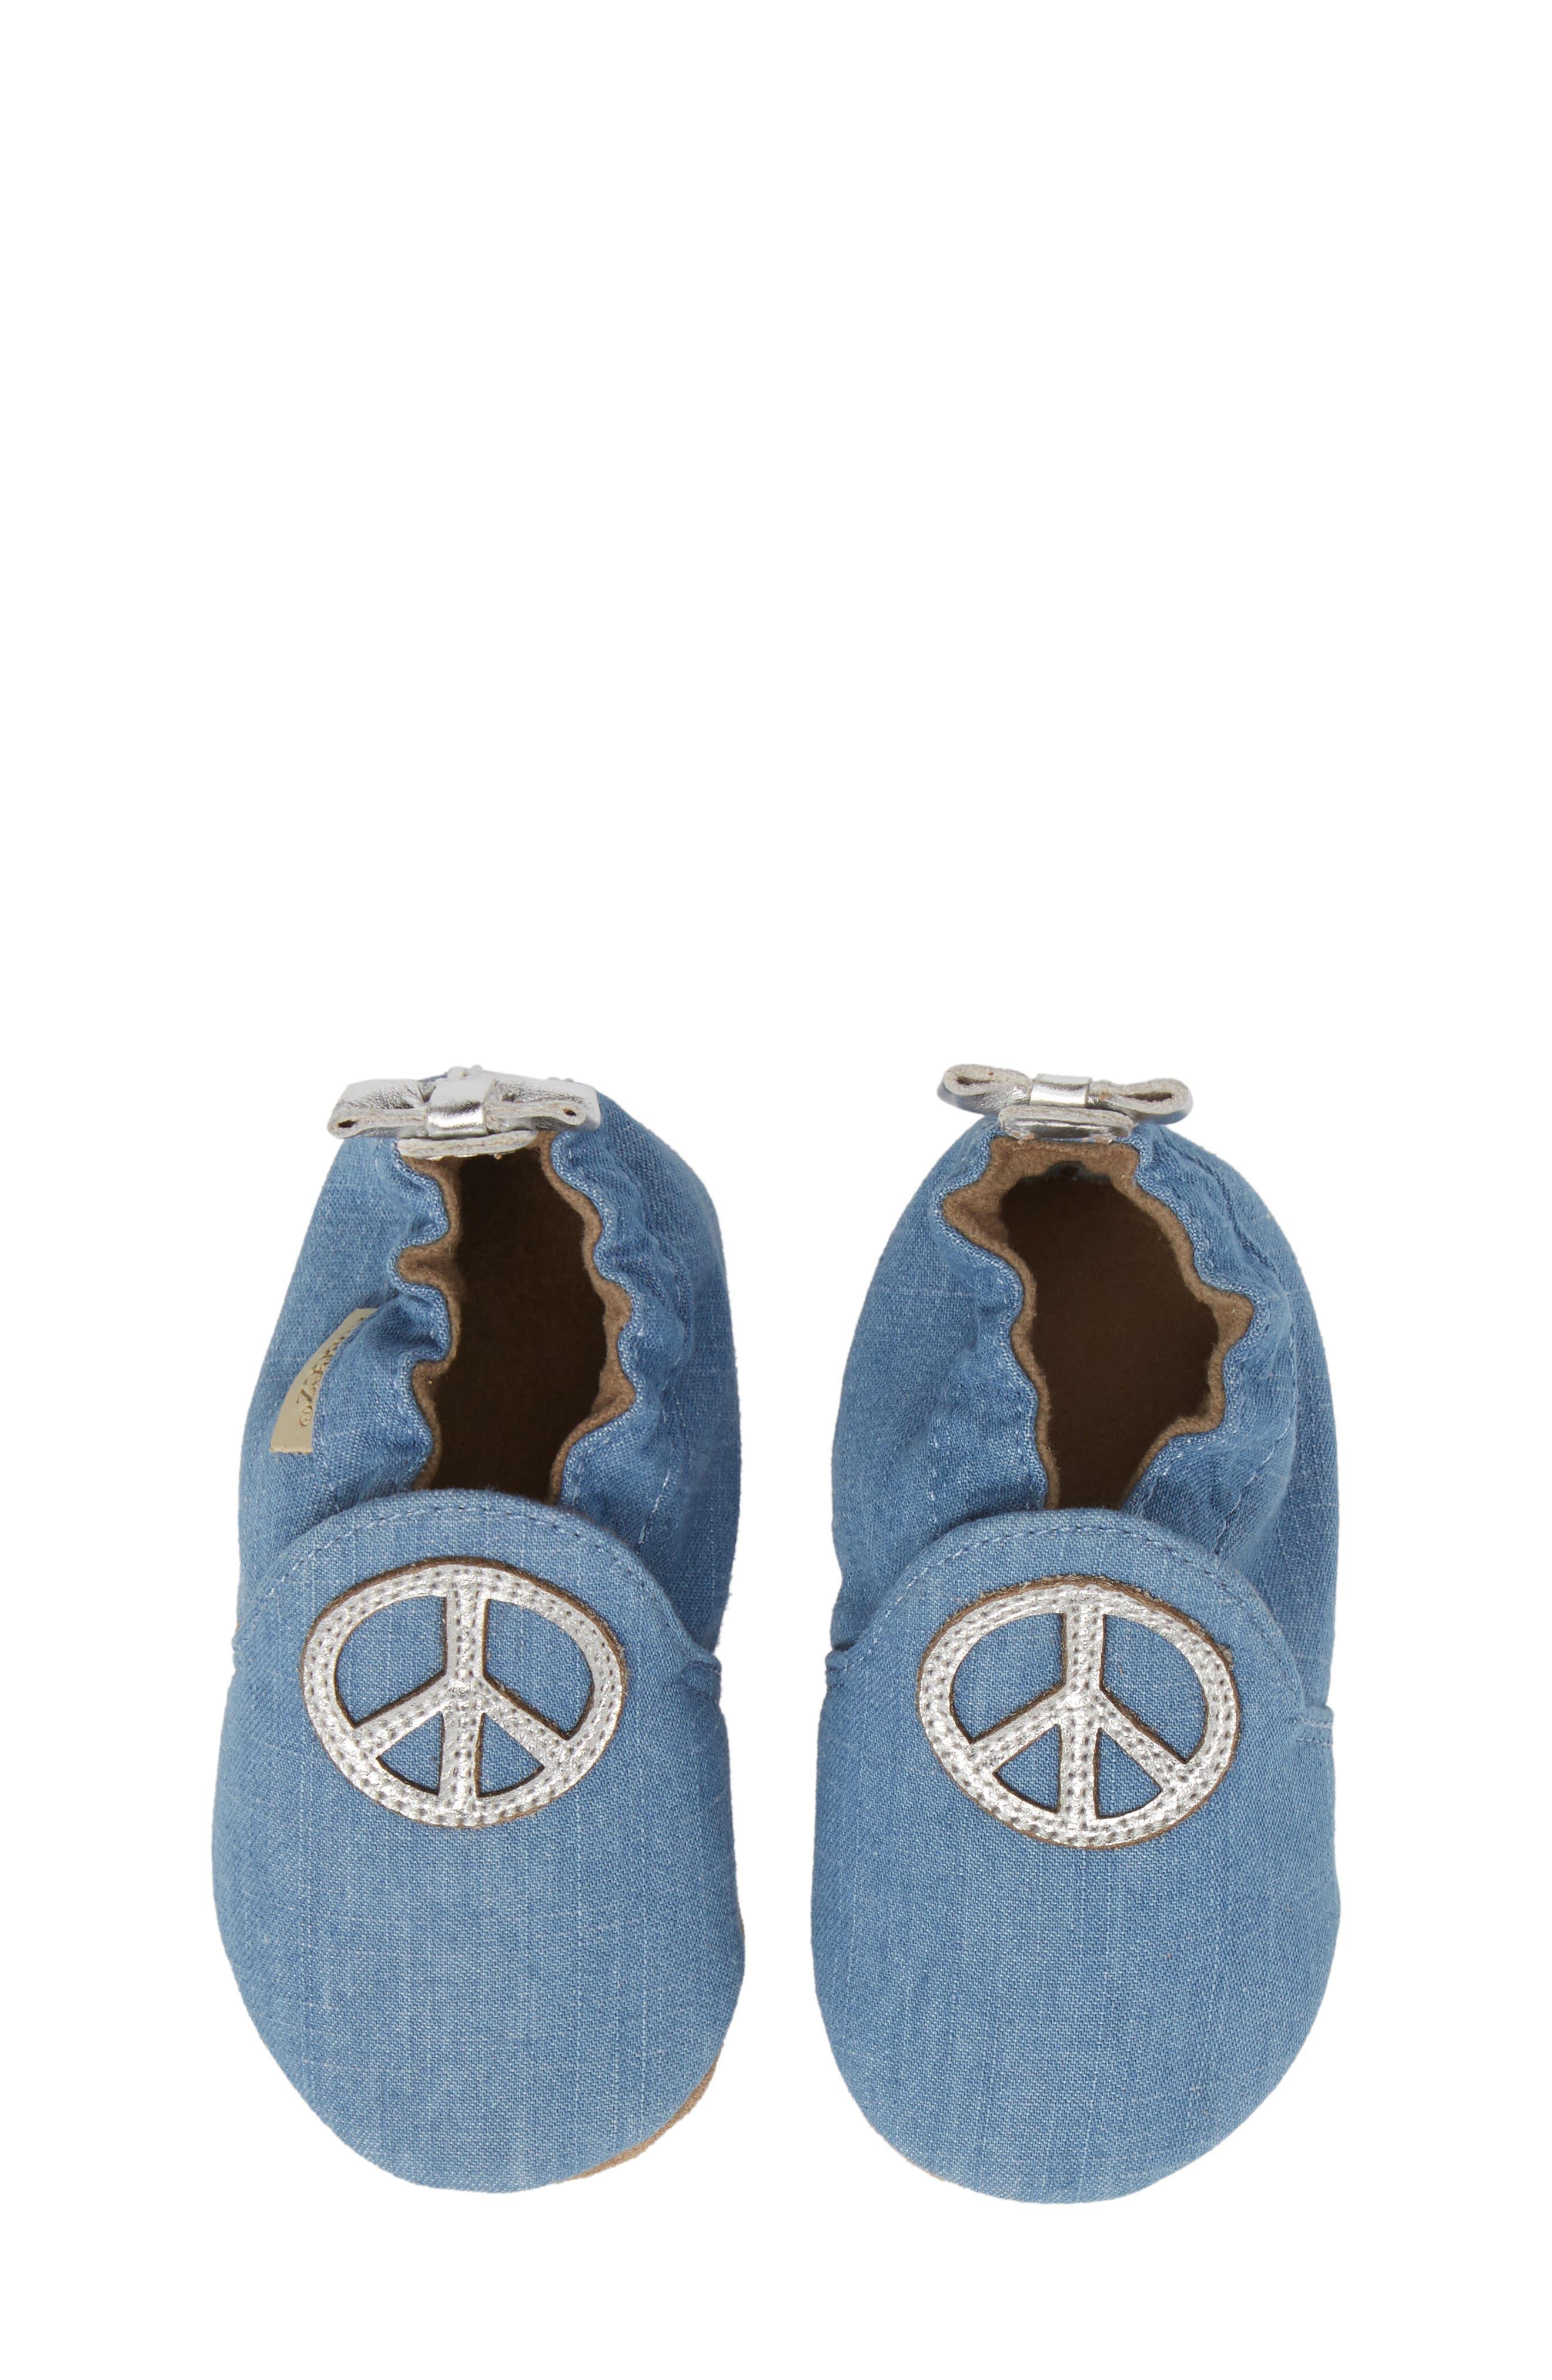 Peace Out Moccasin Crib Shoe,                             Main thumbnail 1, color,                             Blue